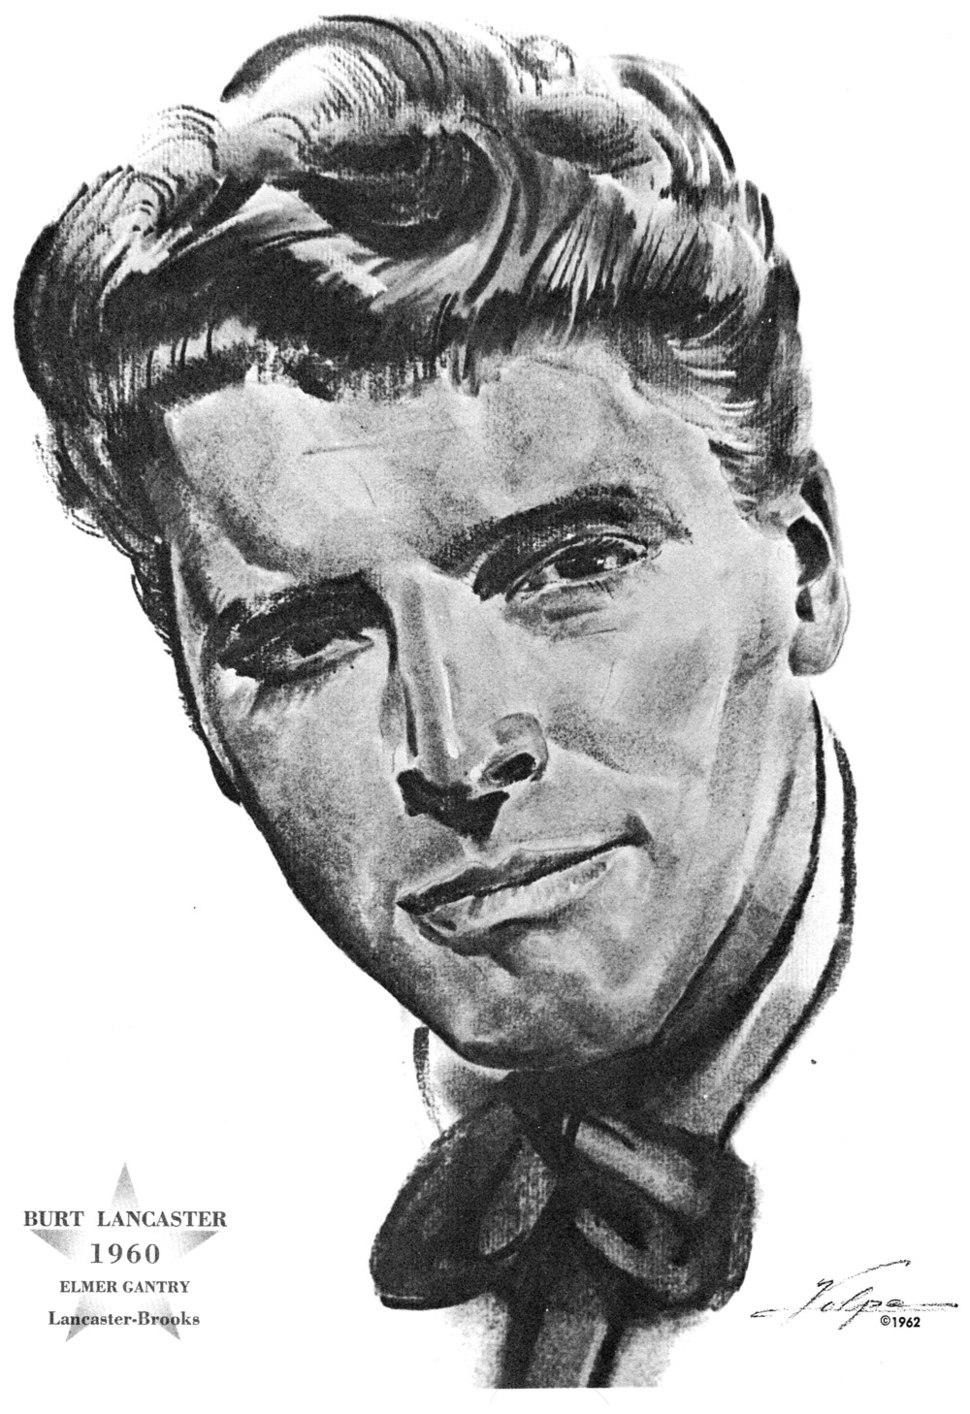 Burt Lancaster 1960